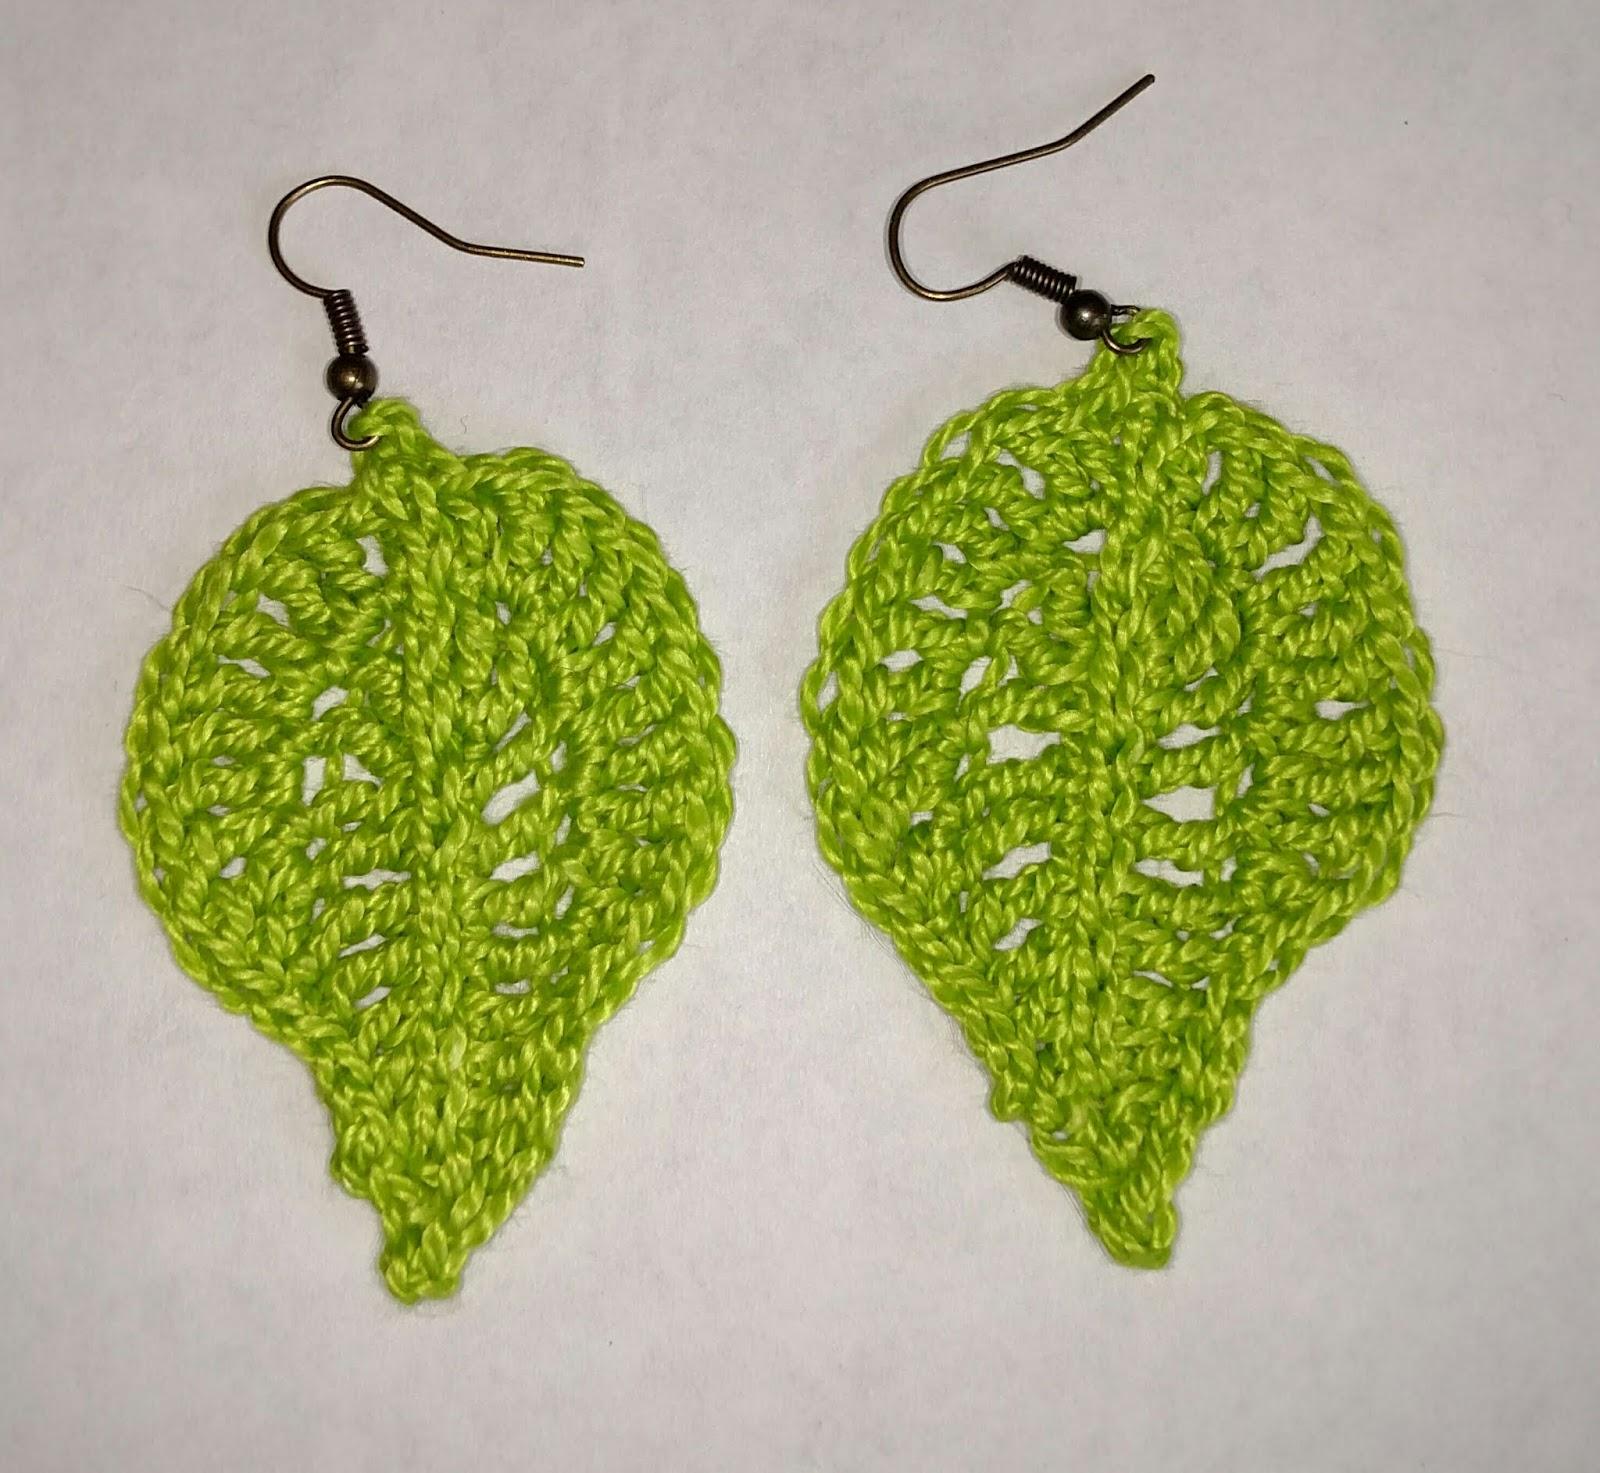 Karen Ilari Painting Large Leaf Earrings